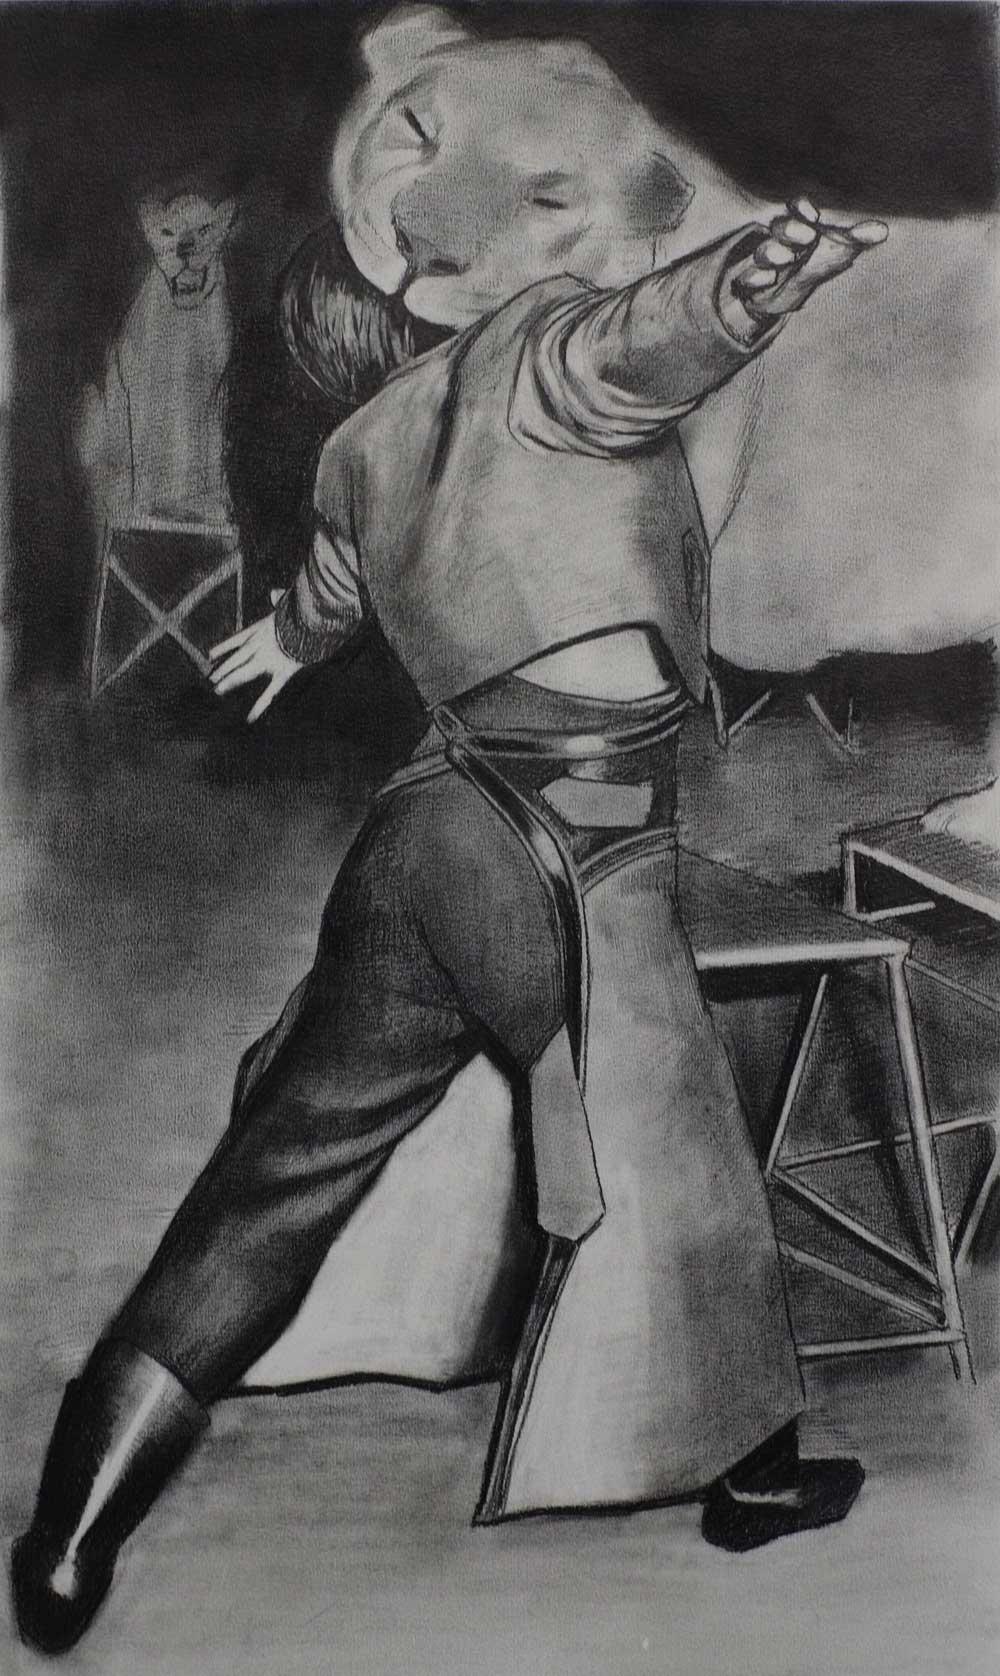 Douglas Stichbury  The Extension , 2013 Pencil on paper 600 x 420 mm  _______